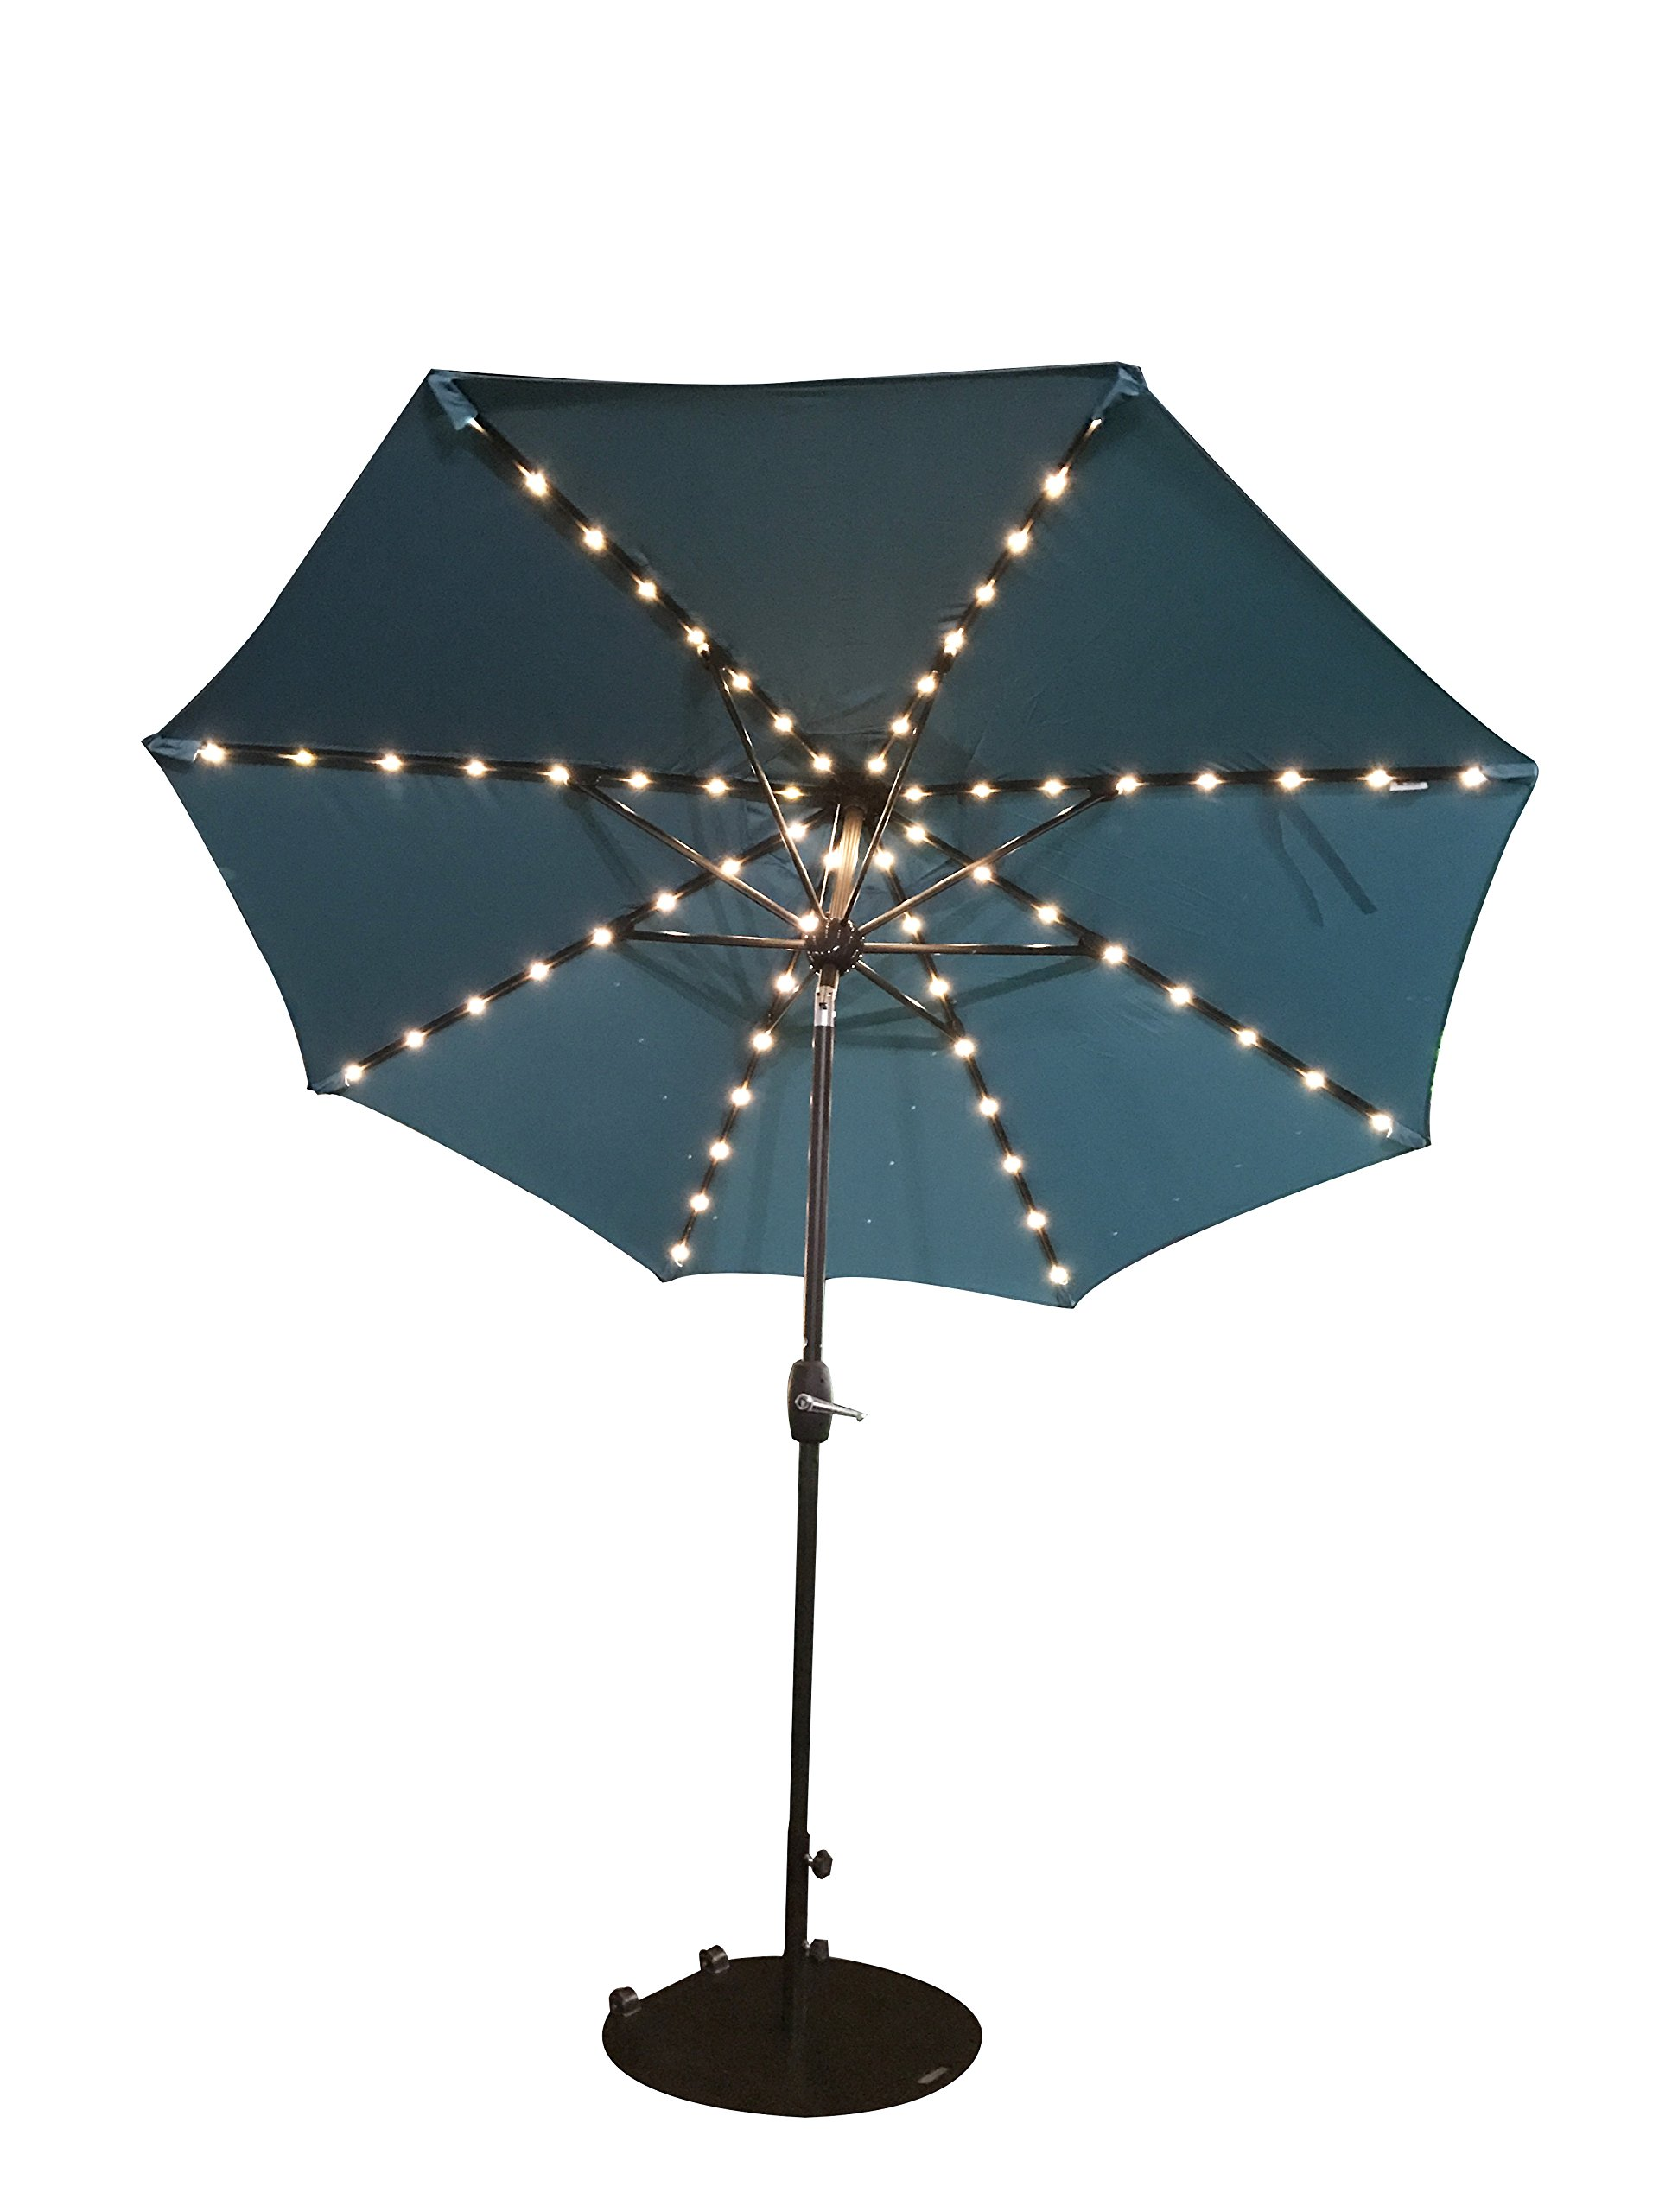 SORARA Patio Umbrella with Solar Powered 64 LED Lights Market Outdoor Umbrella with Tilt&Crank&Umbrella Cover, 9 Feet, Turquoise